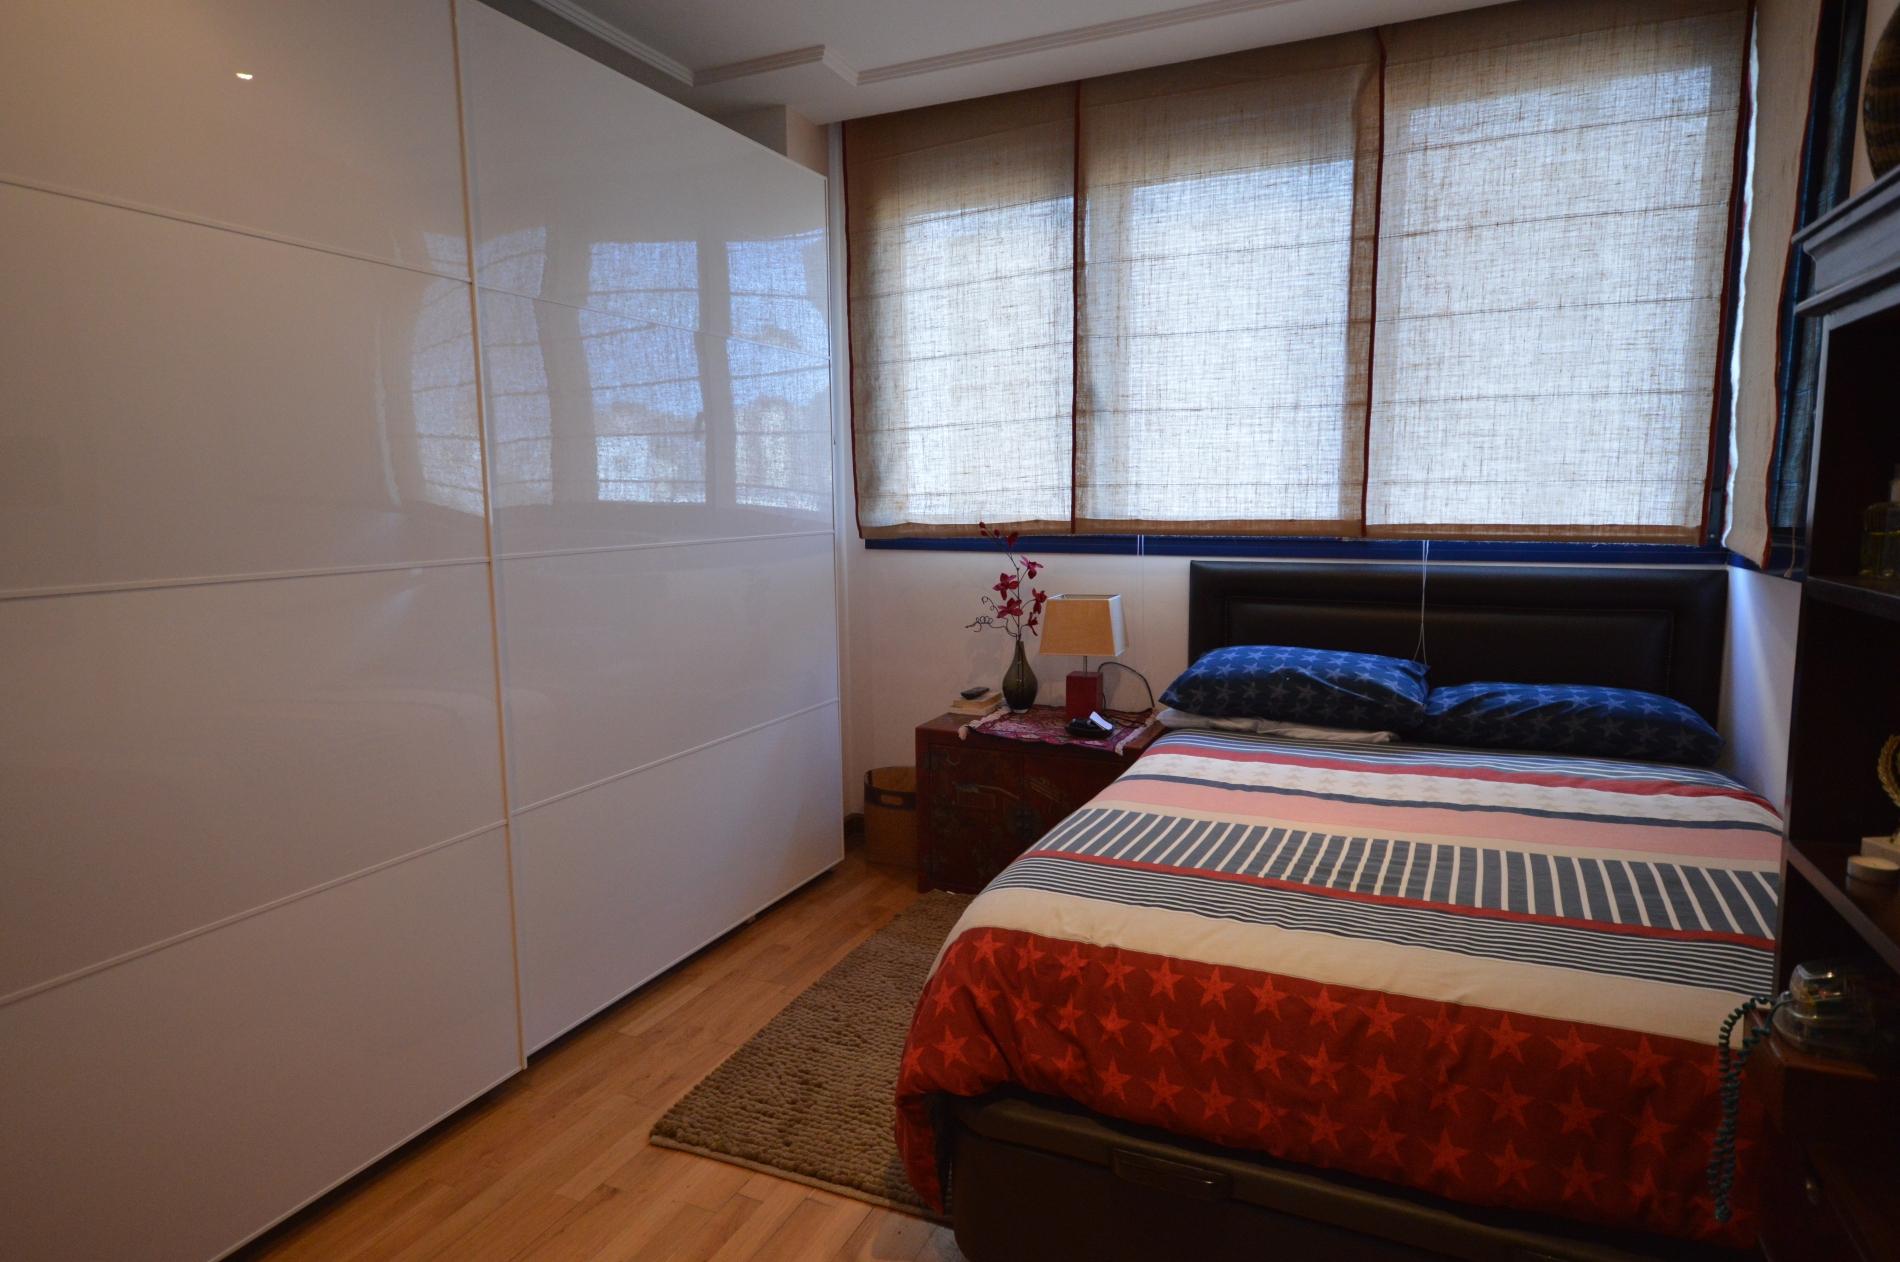 Property in Europlaza Image 7